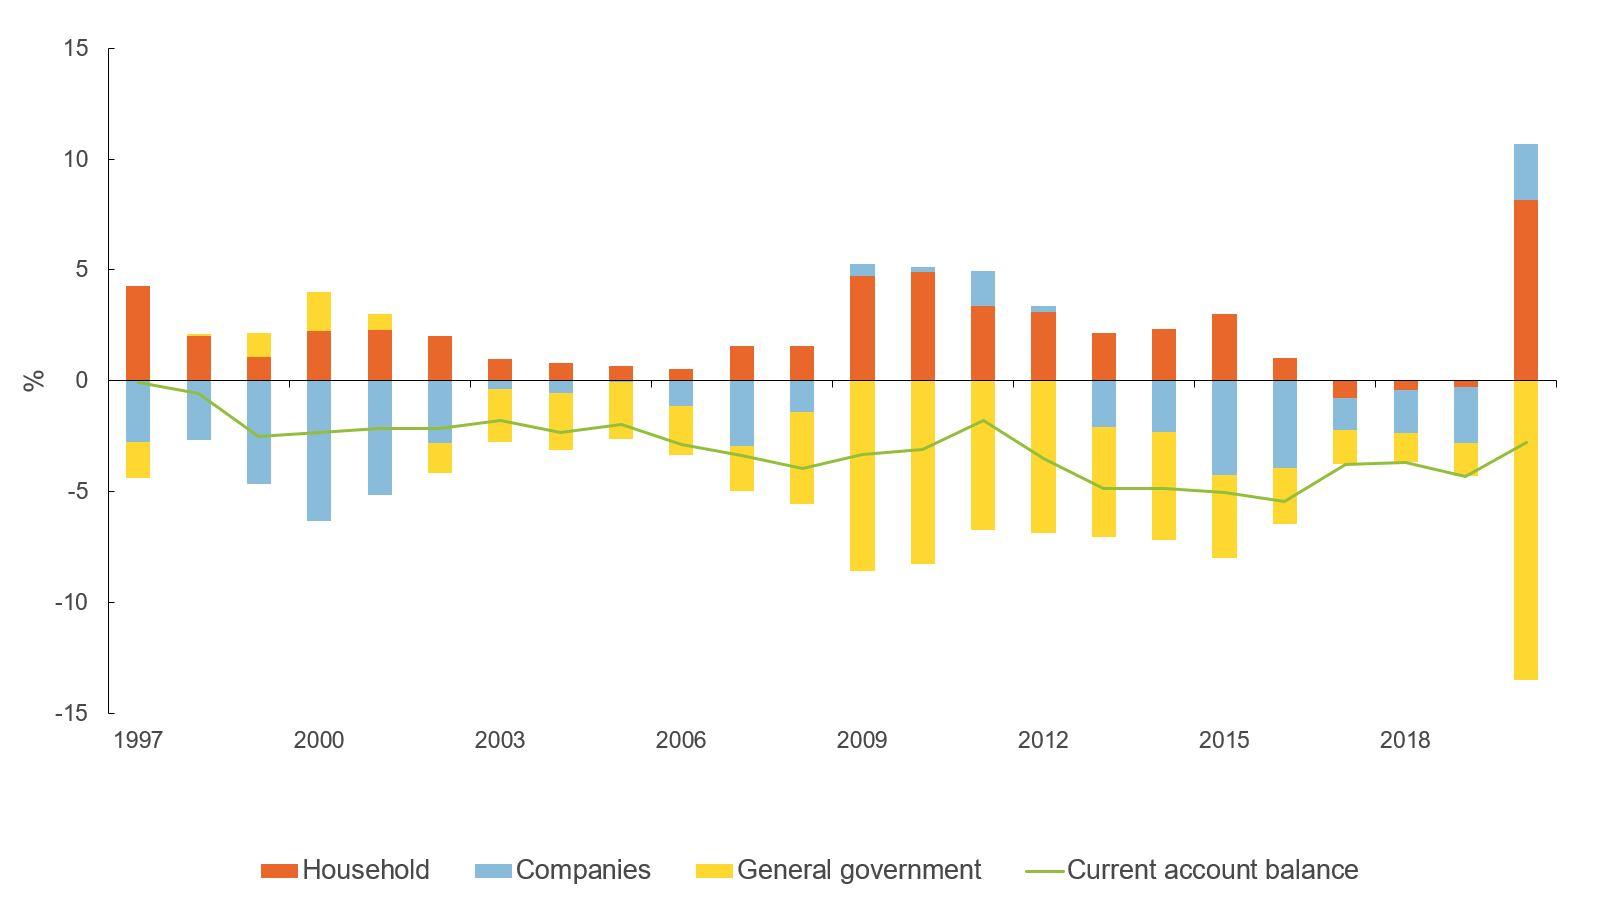 Figure showing sectoral balances